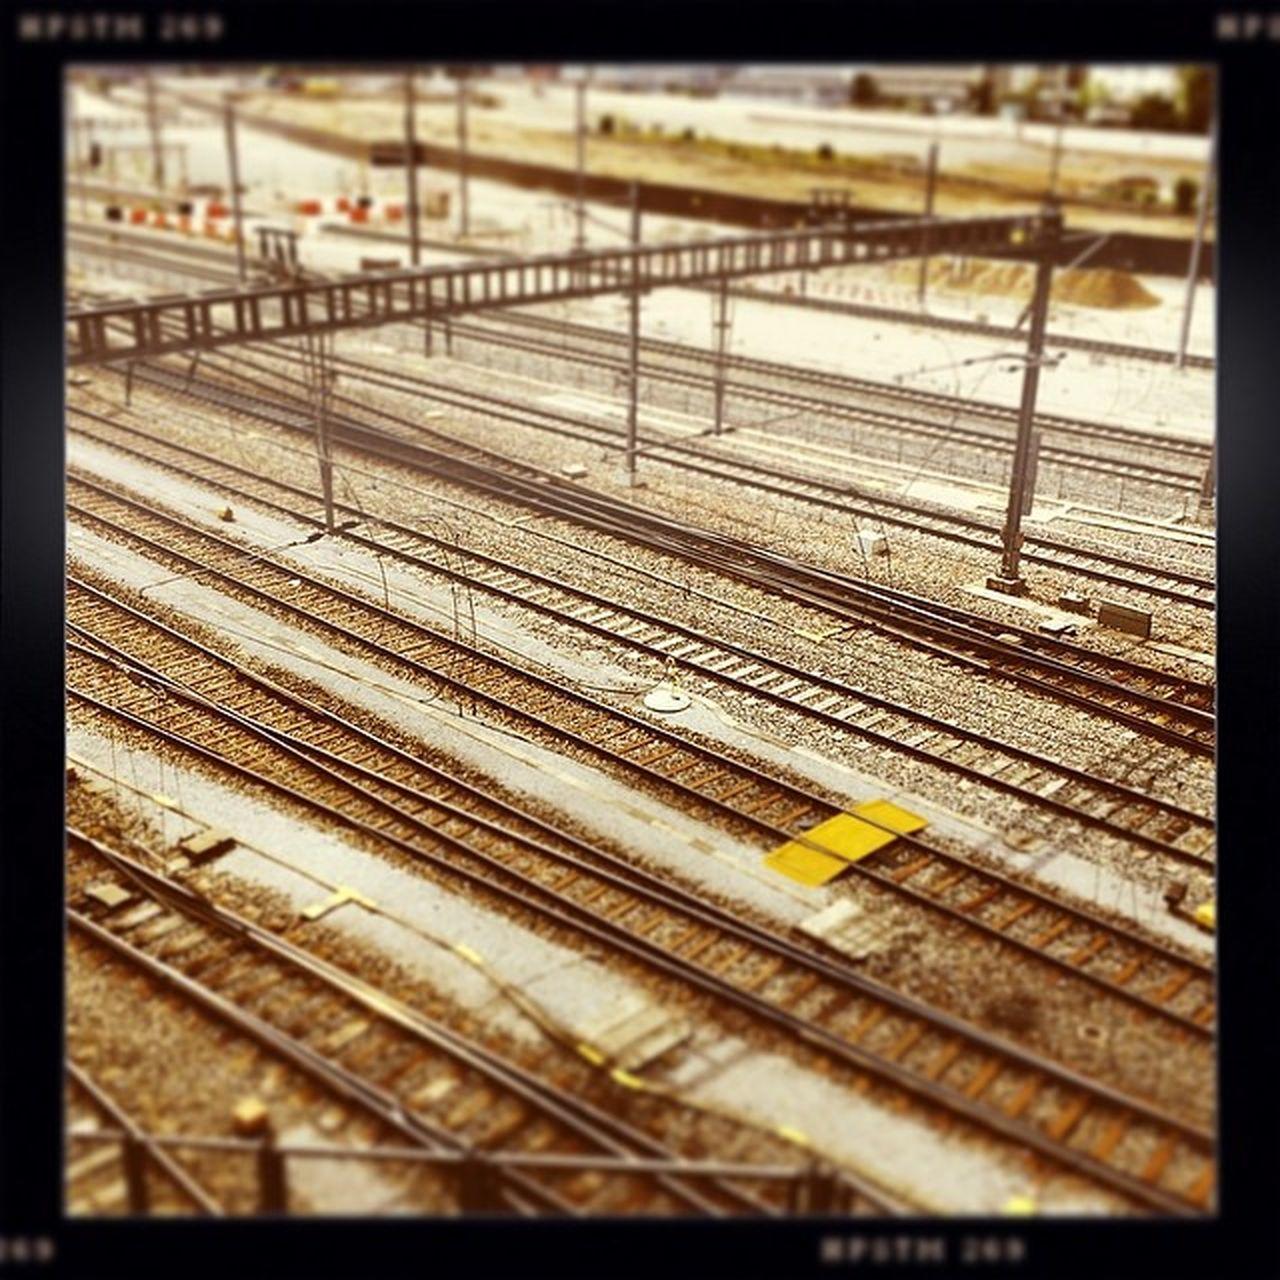 #heimweg #wayhome #stonesonfire #rollingstones #zurich #switzerland #train #railway #concert